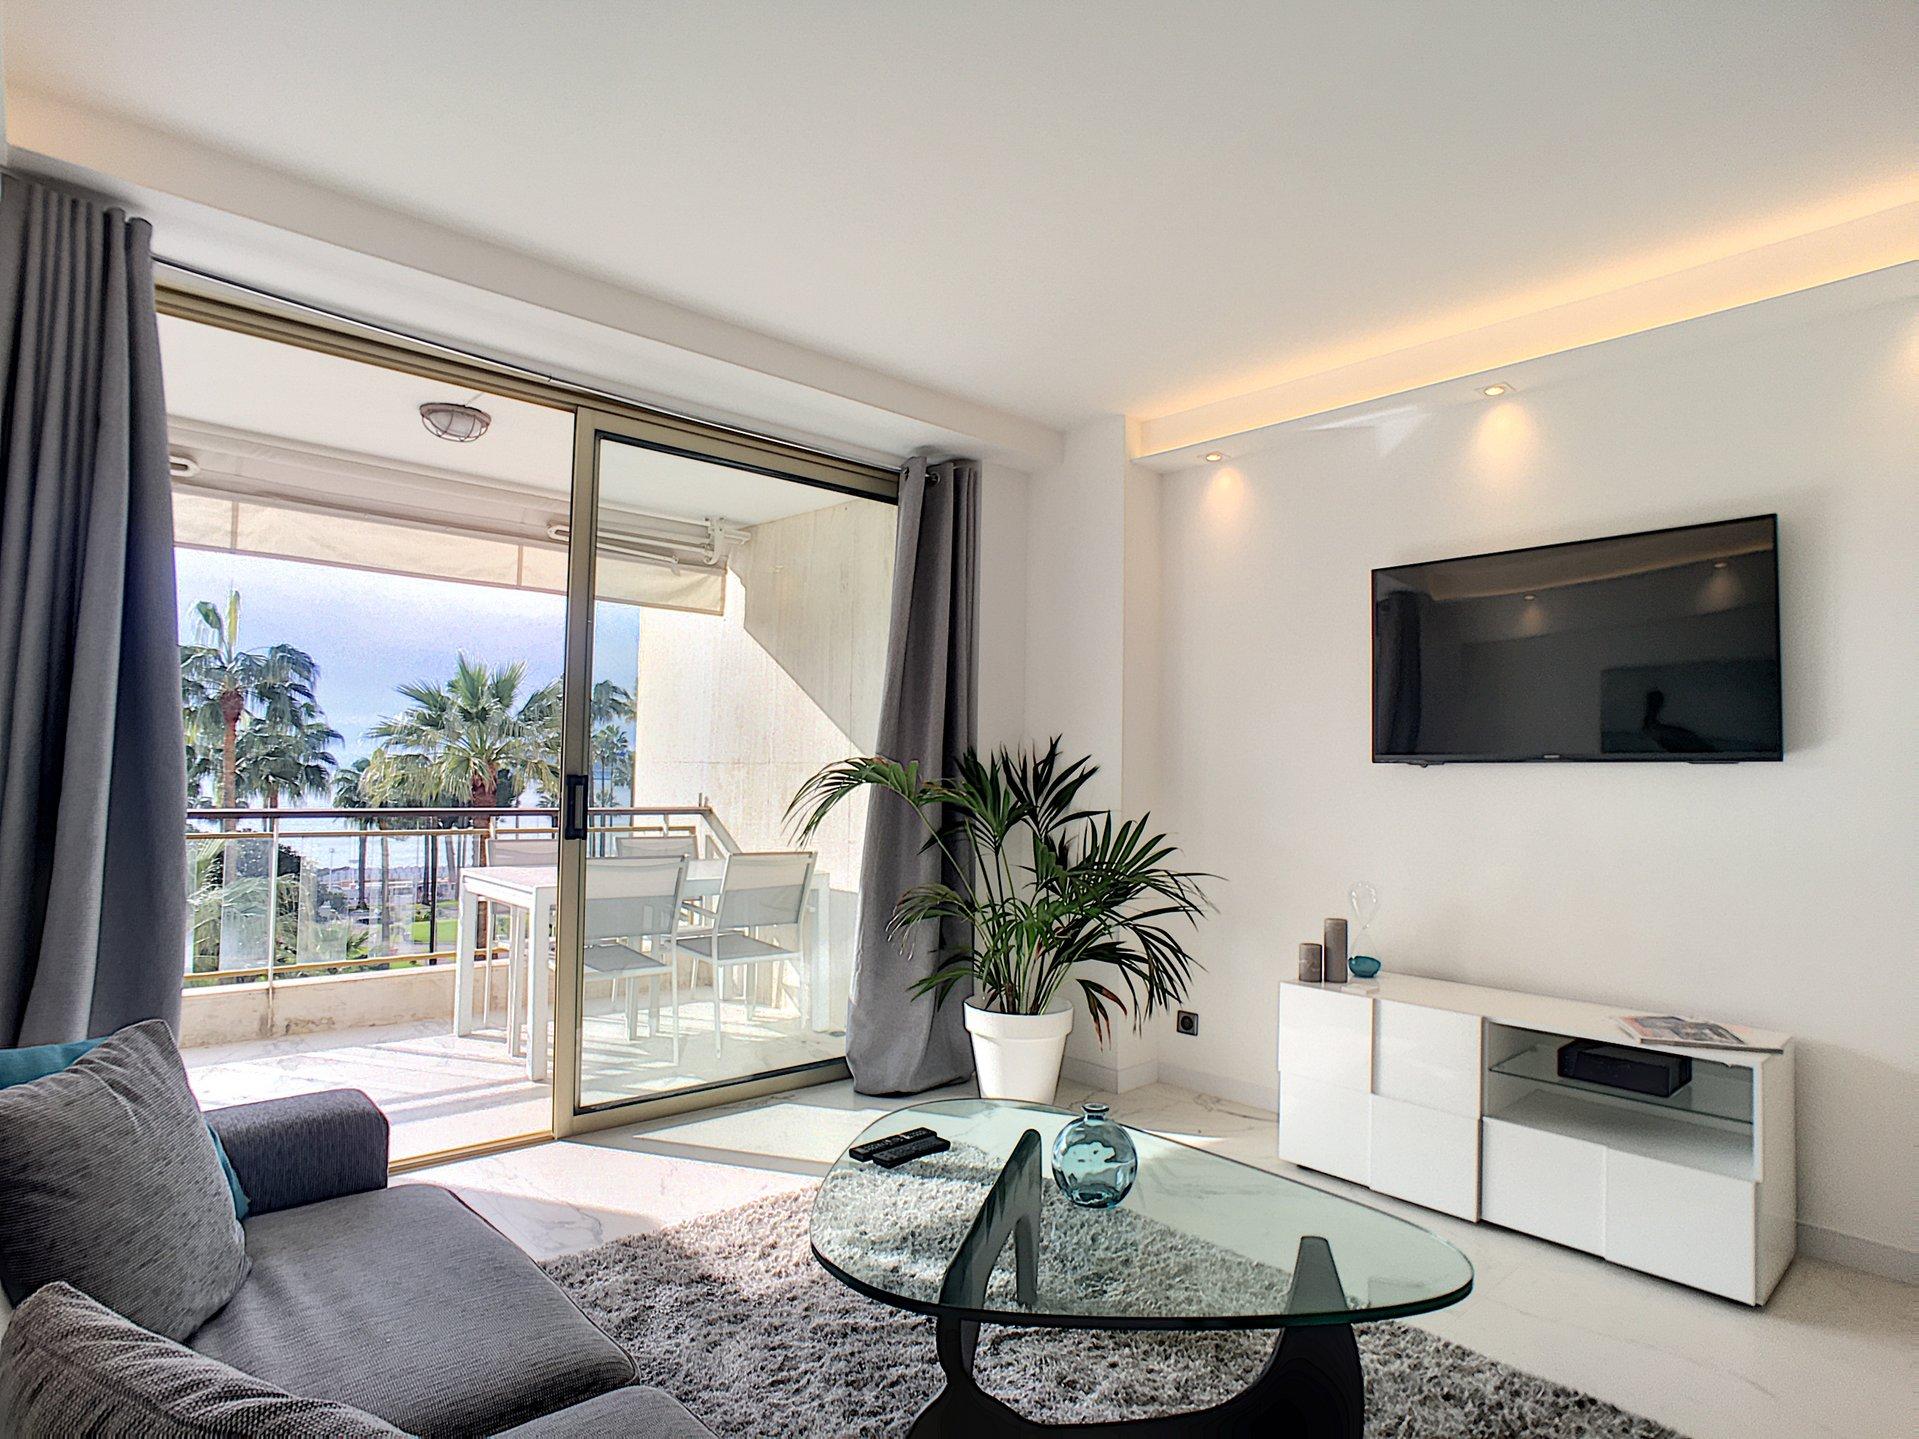 Cannes Croisette - Le Grand Hotel